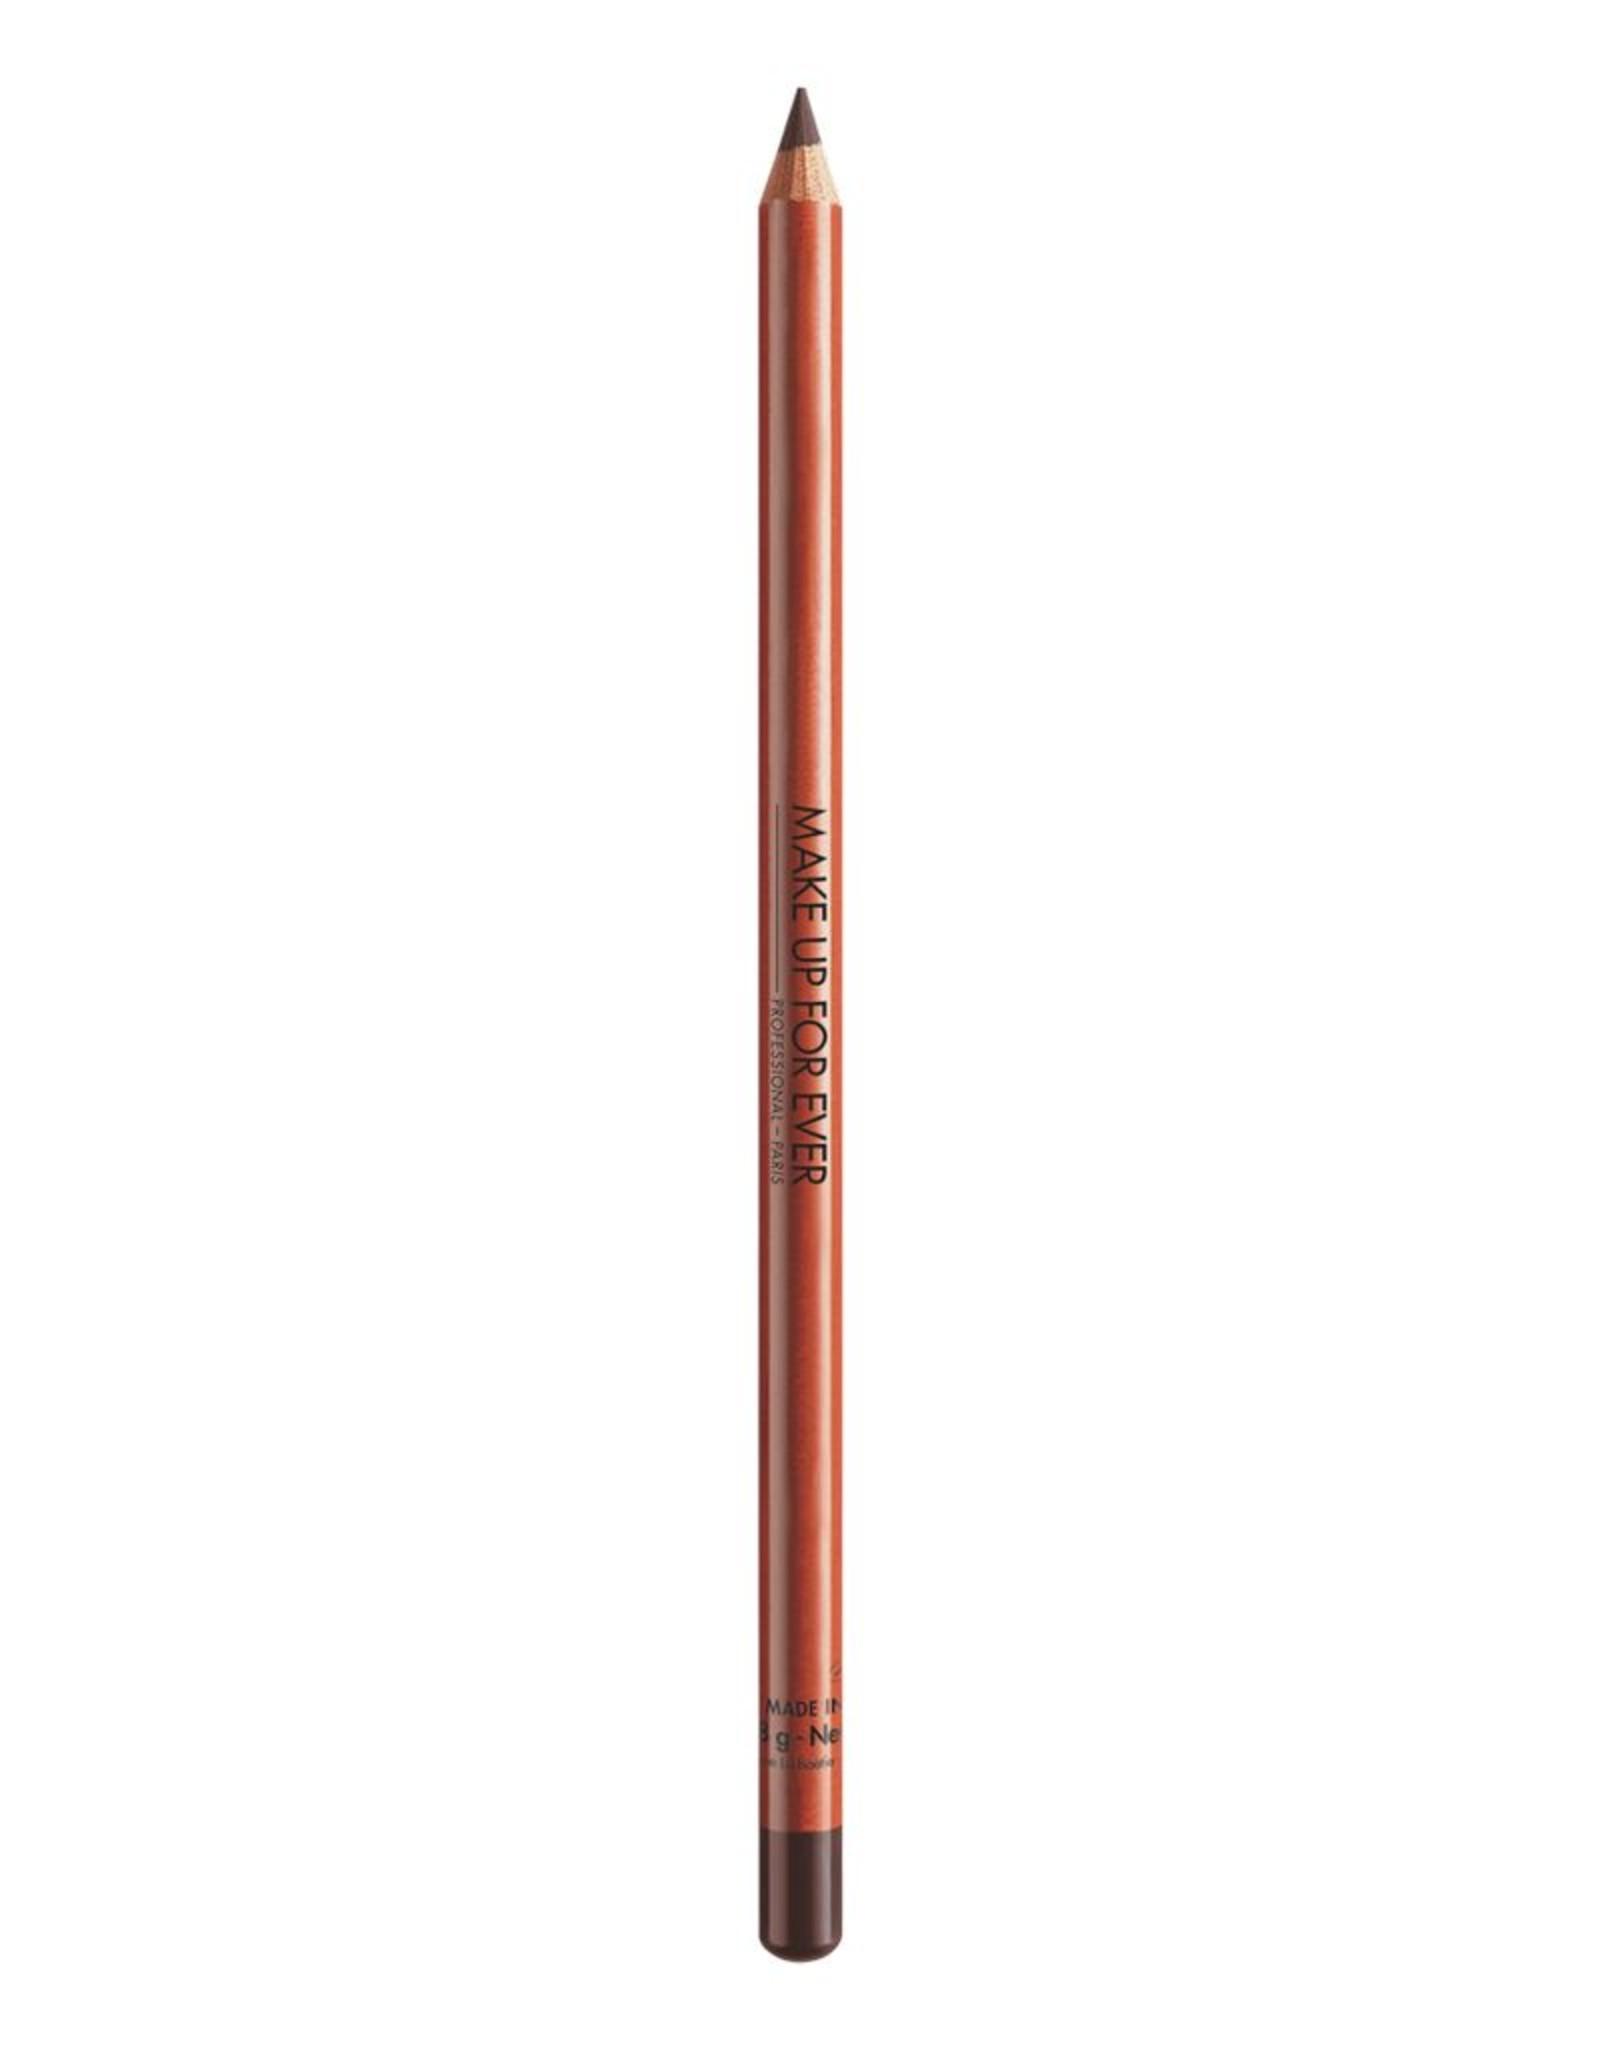 MUFE CRAYON LEVRES 1,8g N47 bordeaux /  burgundy